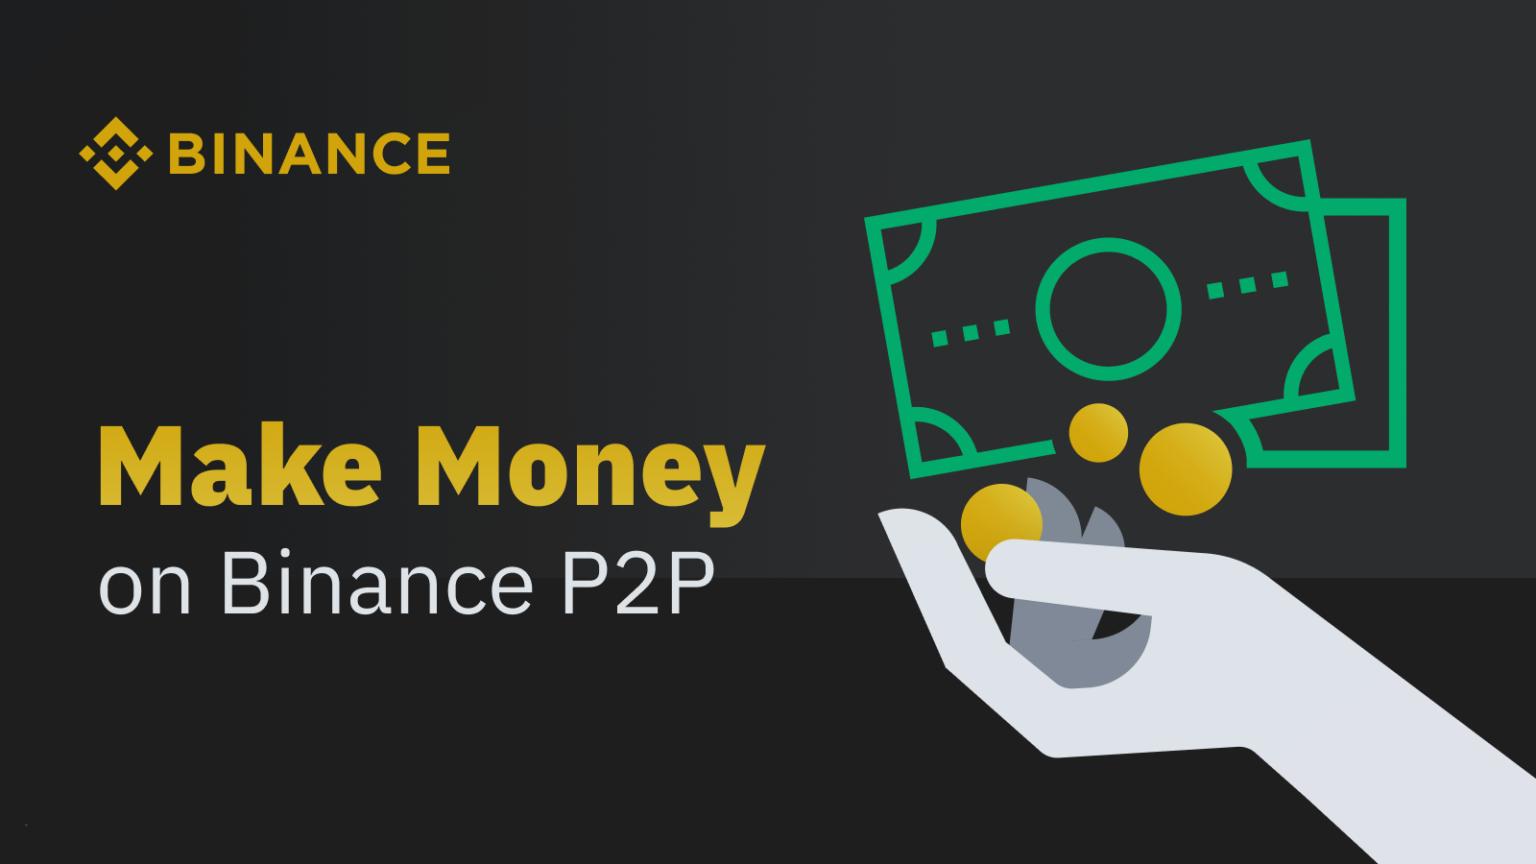 заработать на P2p Binance